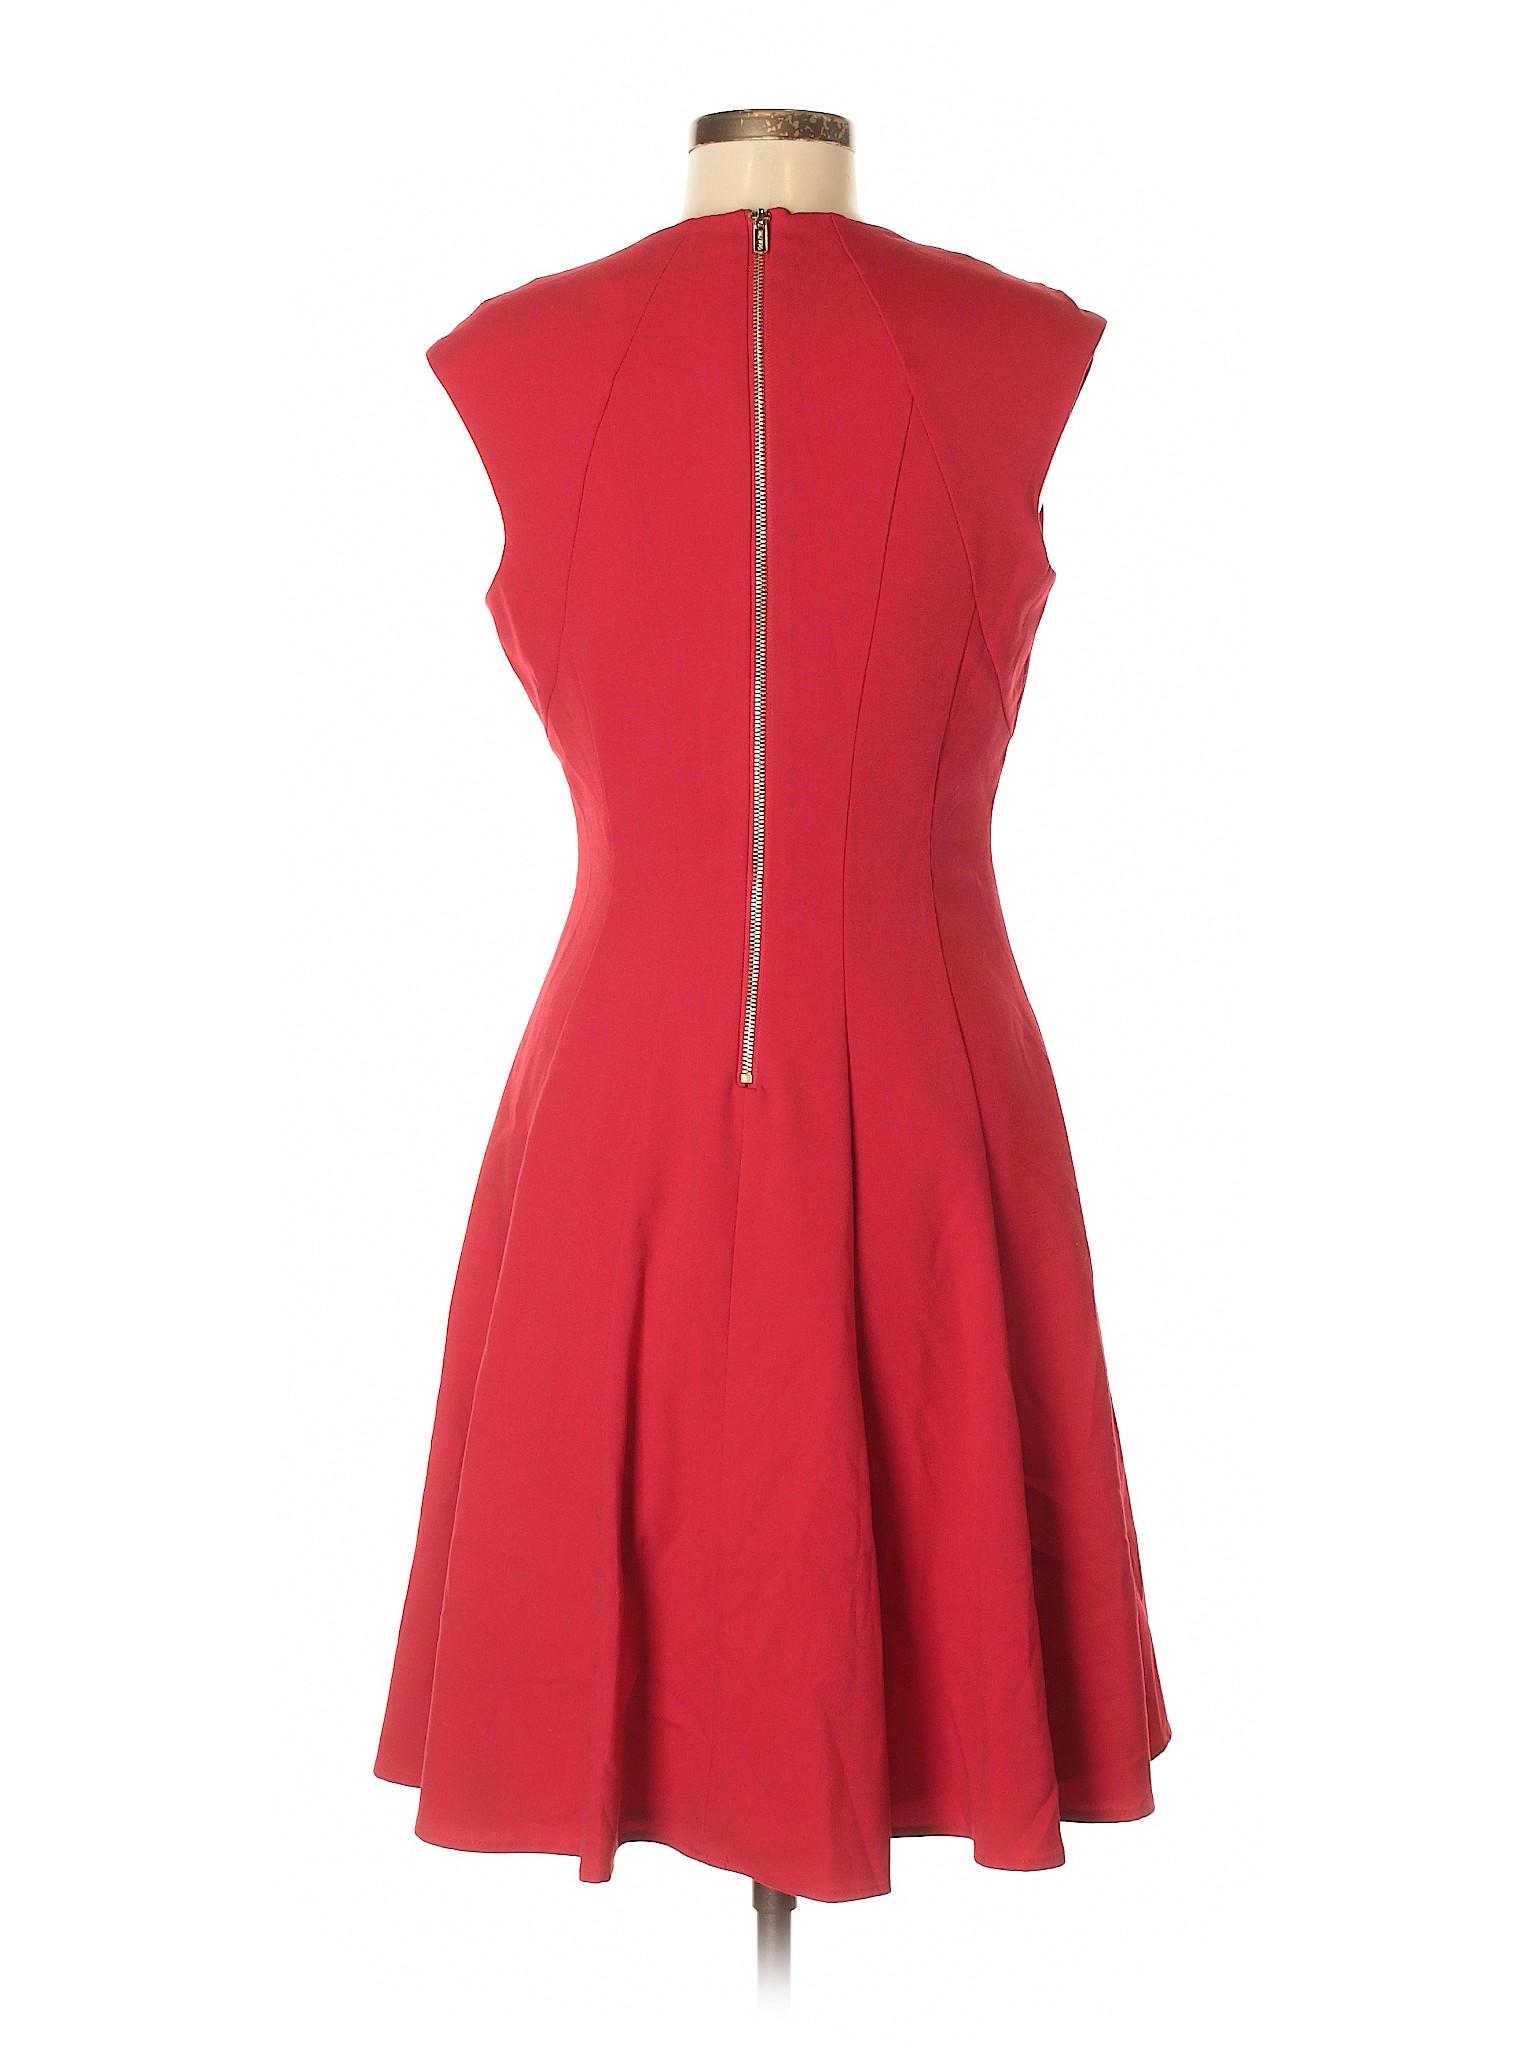 Klein winter Dress Calvin Boutique Casual EqH6wf